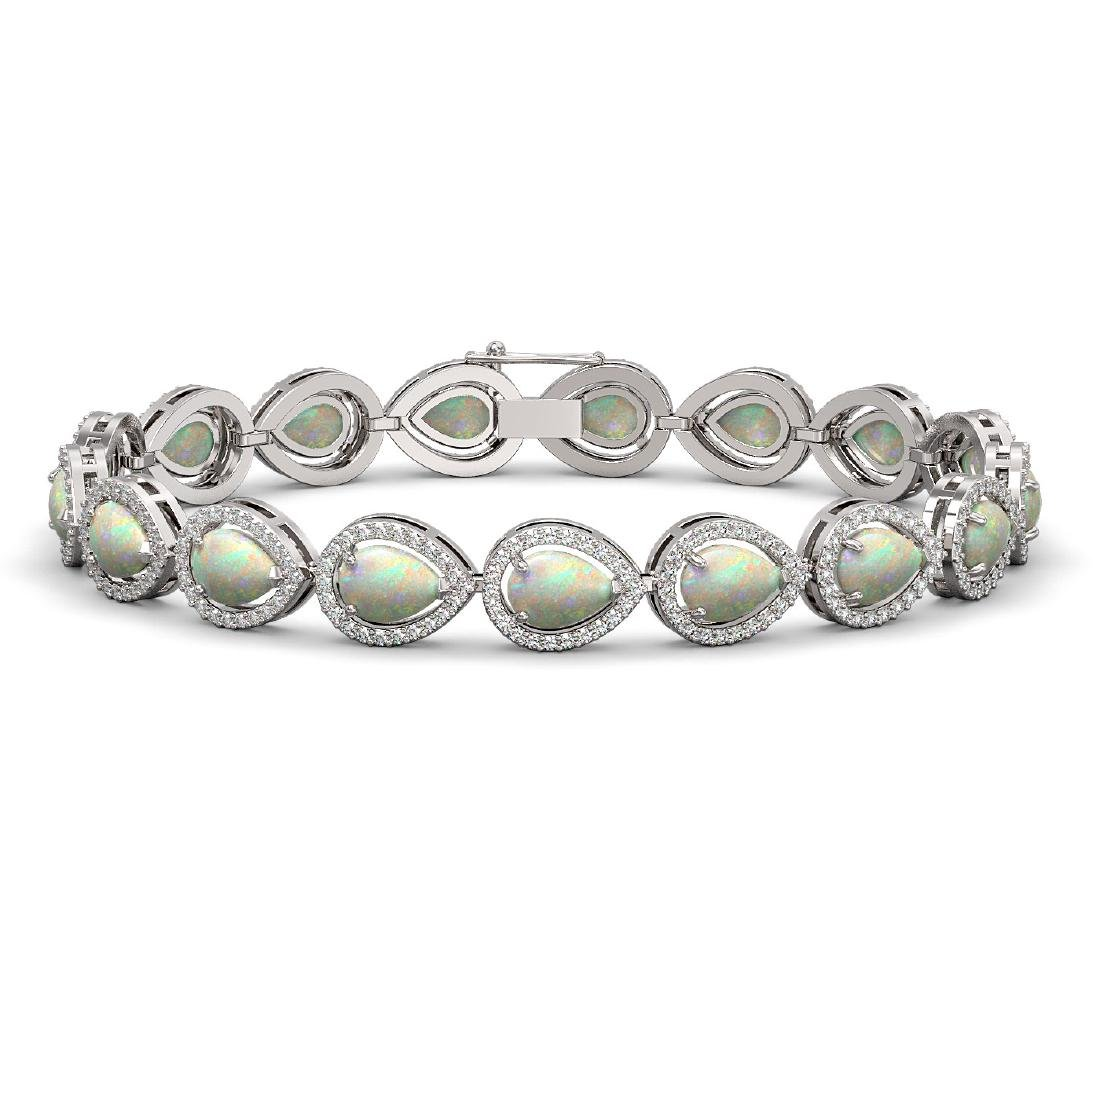 13.19 CTW Opal & Diamond Halo Bracelet 10K White Gold